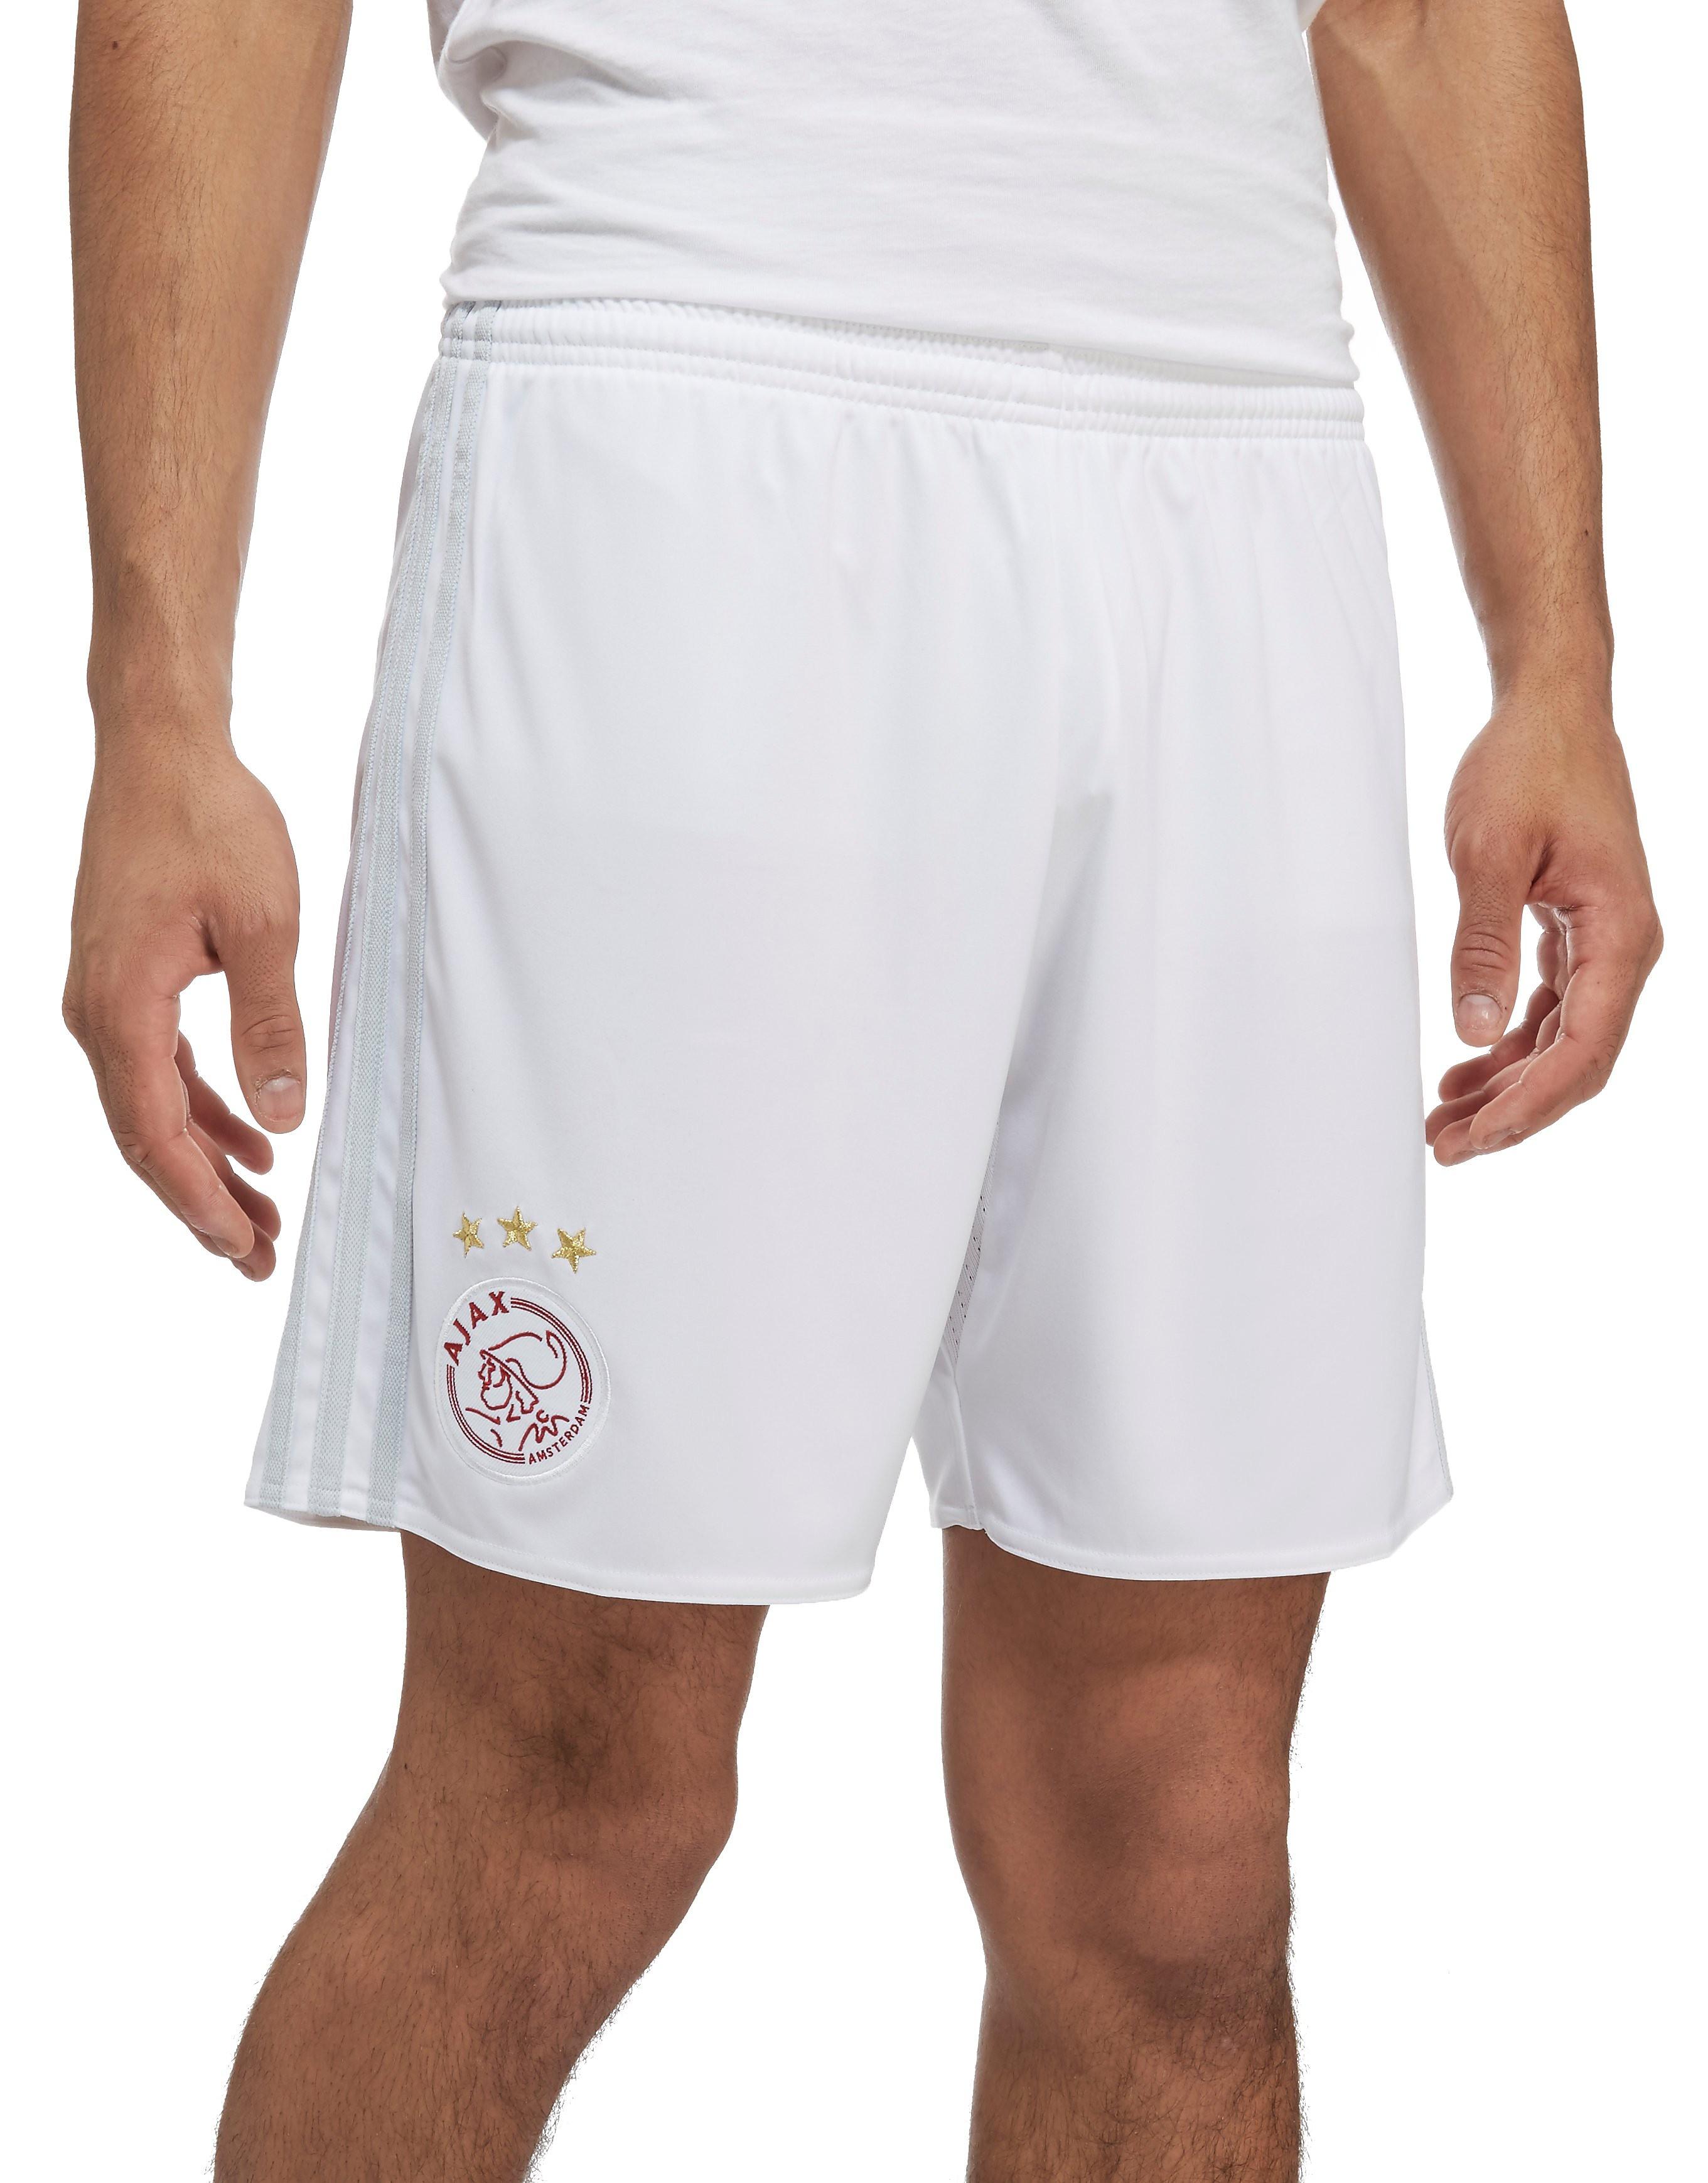 adidas Ajax 2017/18 Home Shorts